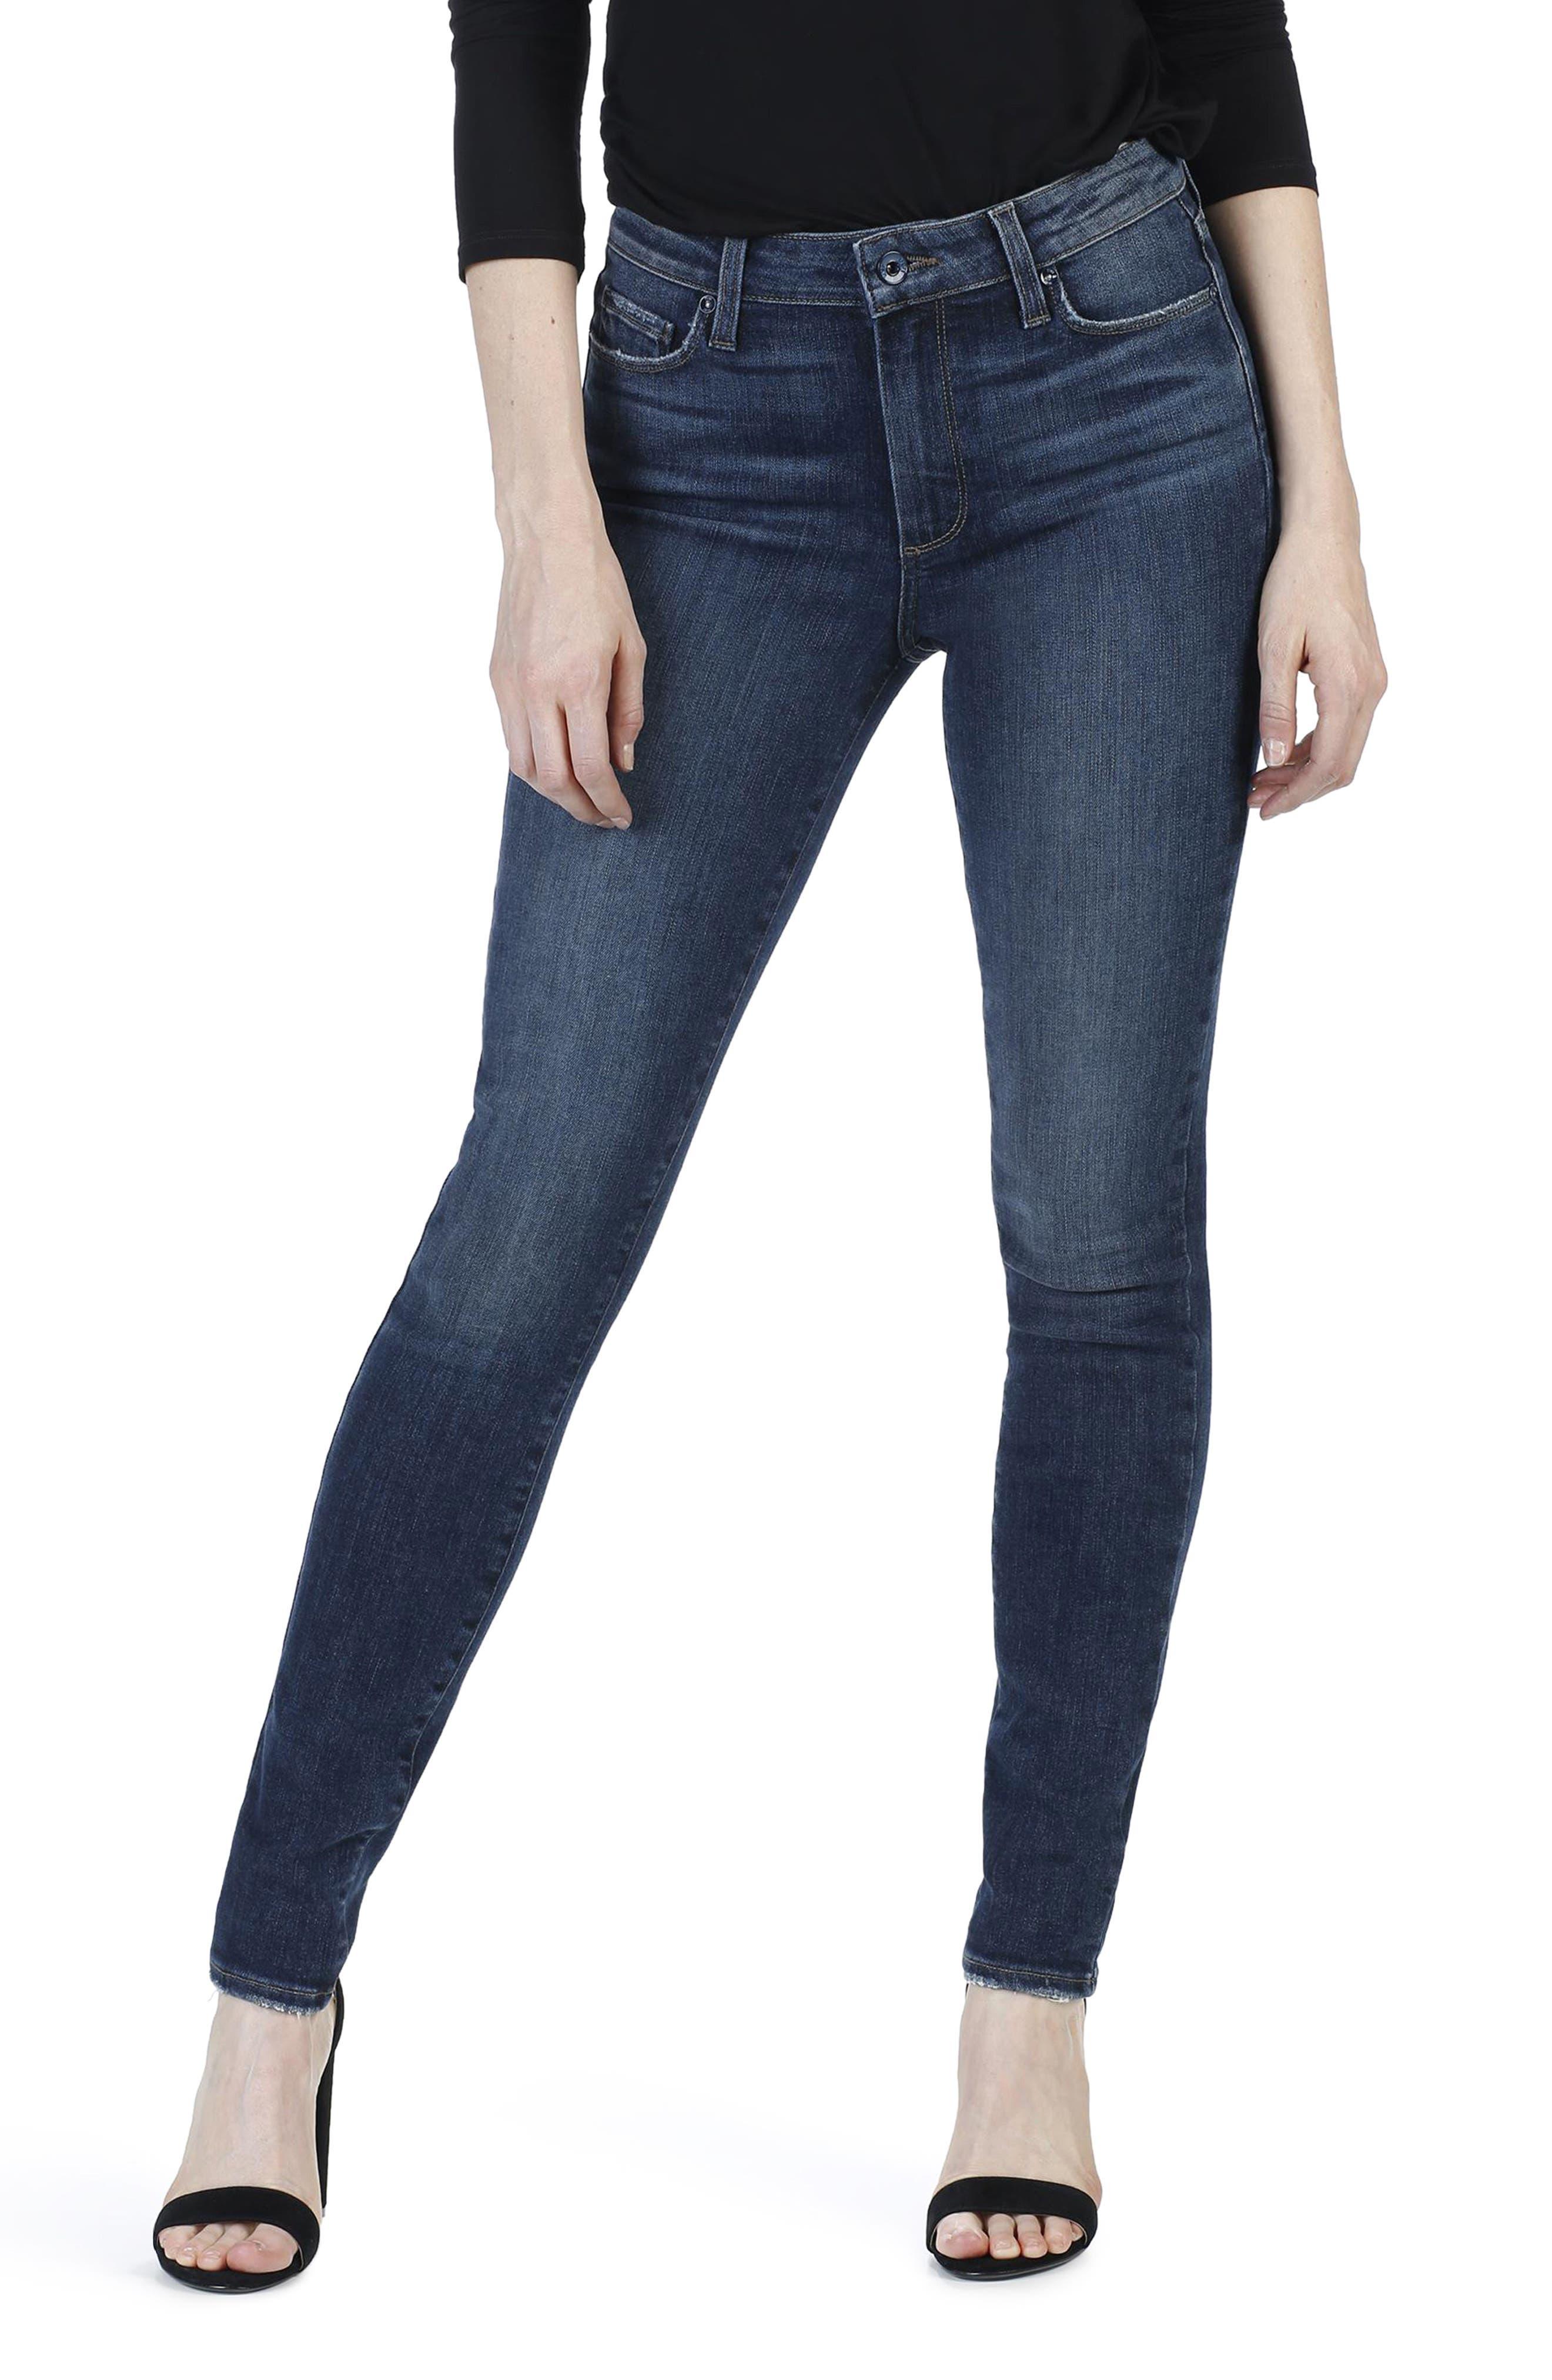 Transcend - Hoxton High Waist Ultra Skinny Jeans,                             Main thumbnail 1, color,                             400